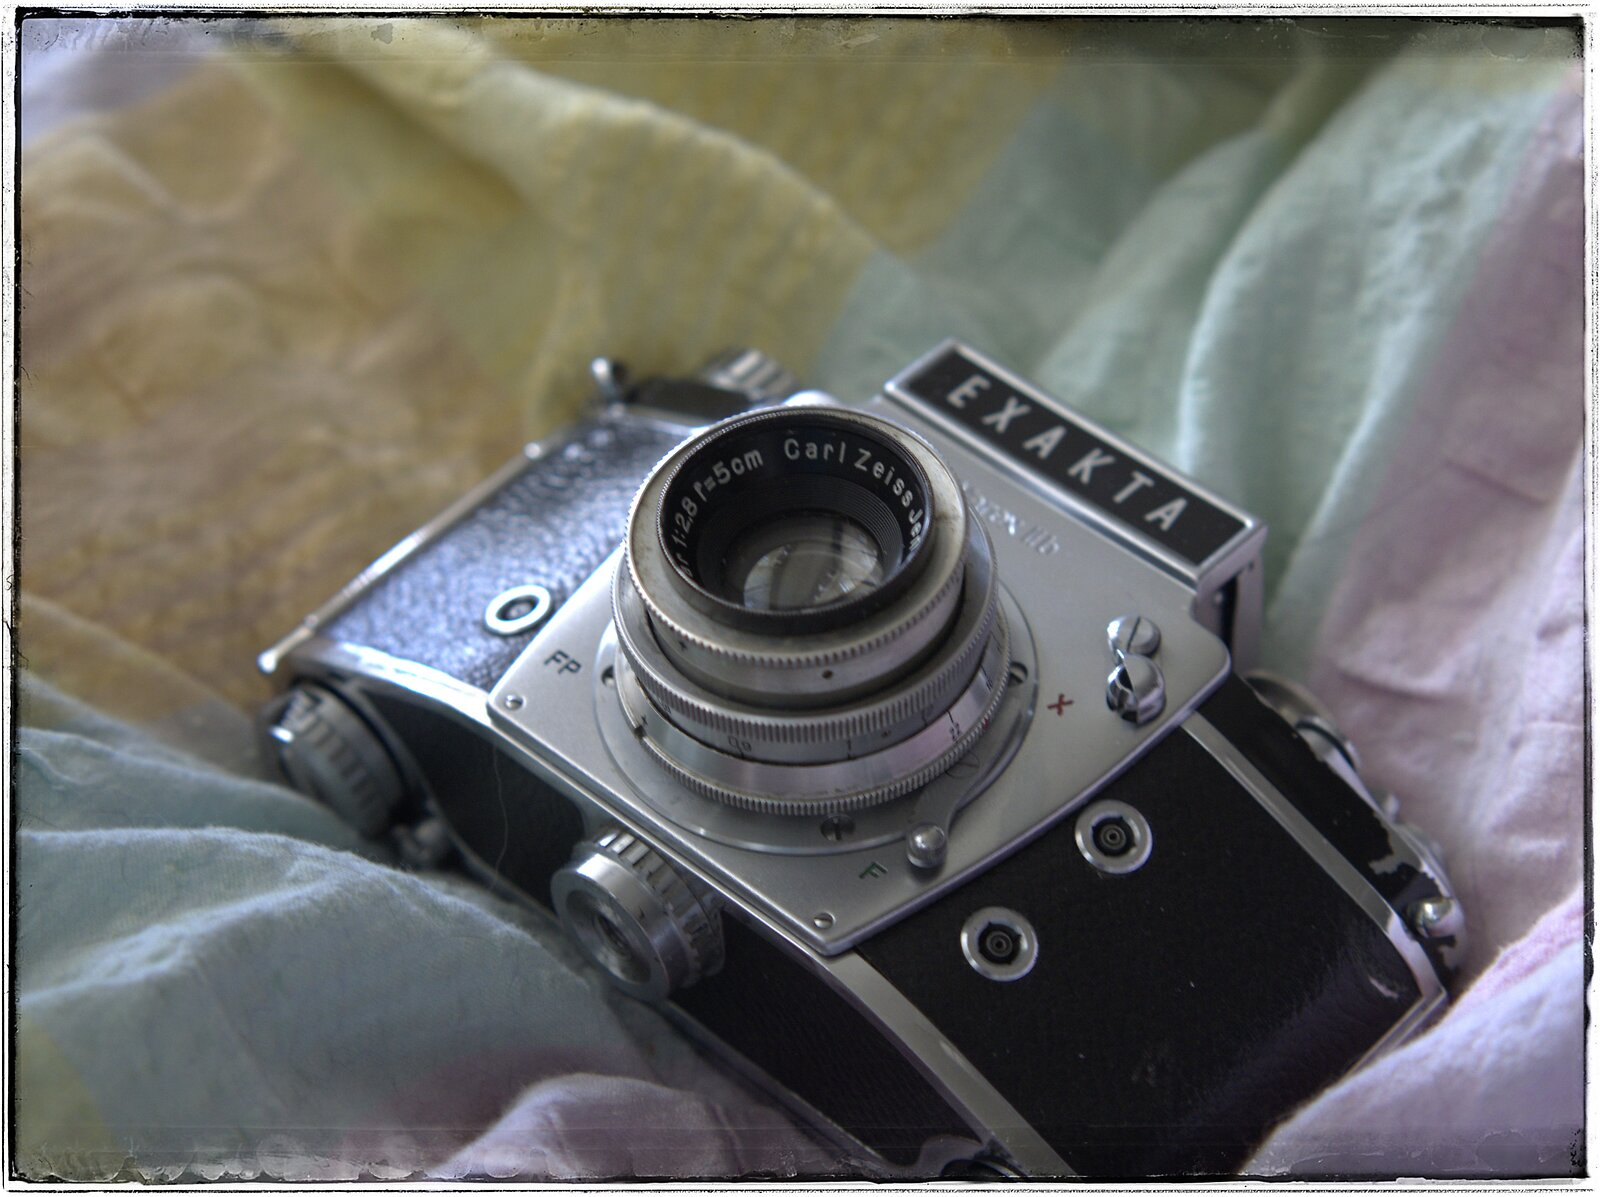 P6050036_DCRAW-01.jpeg